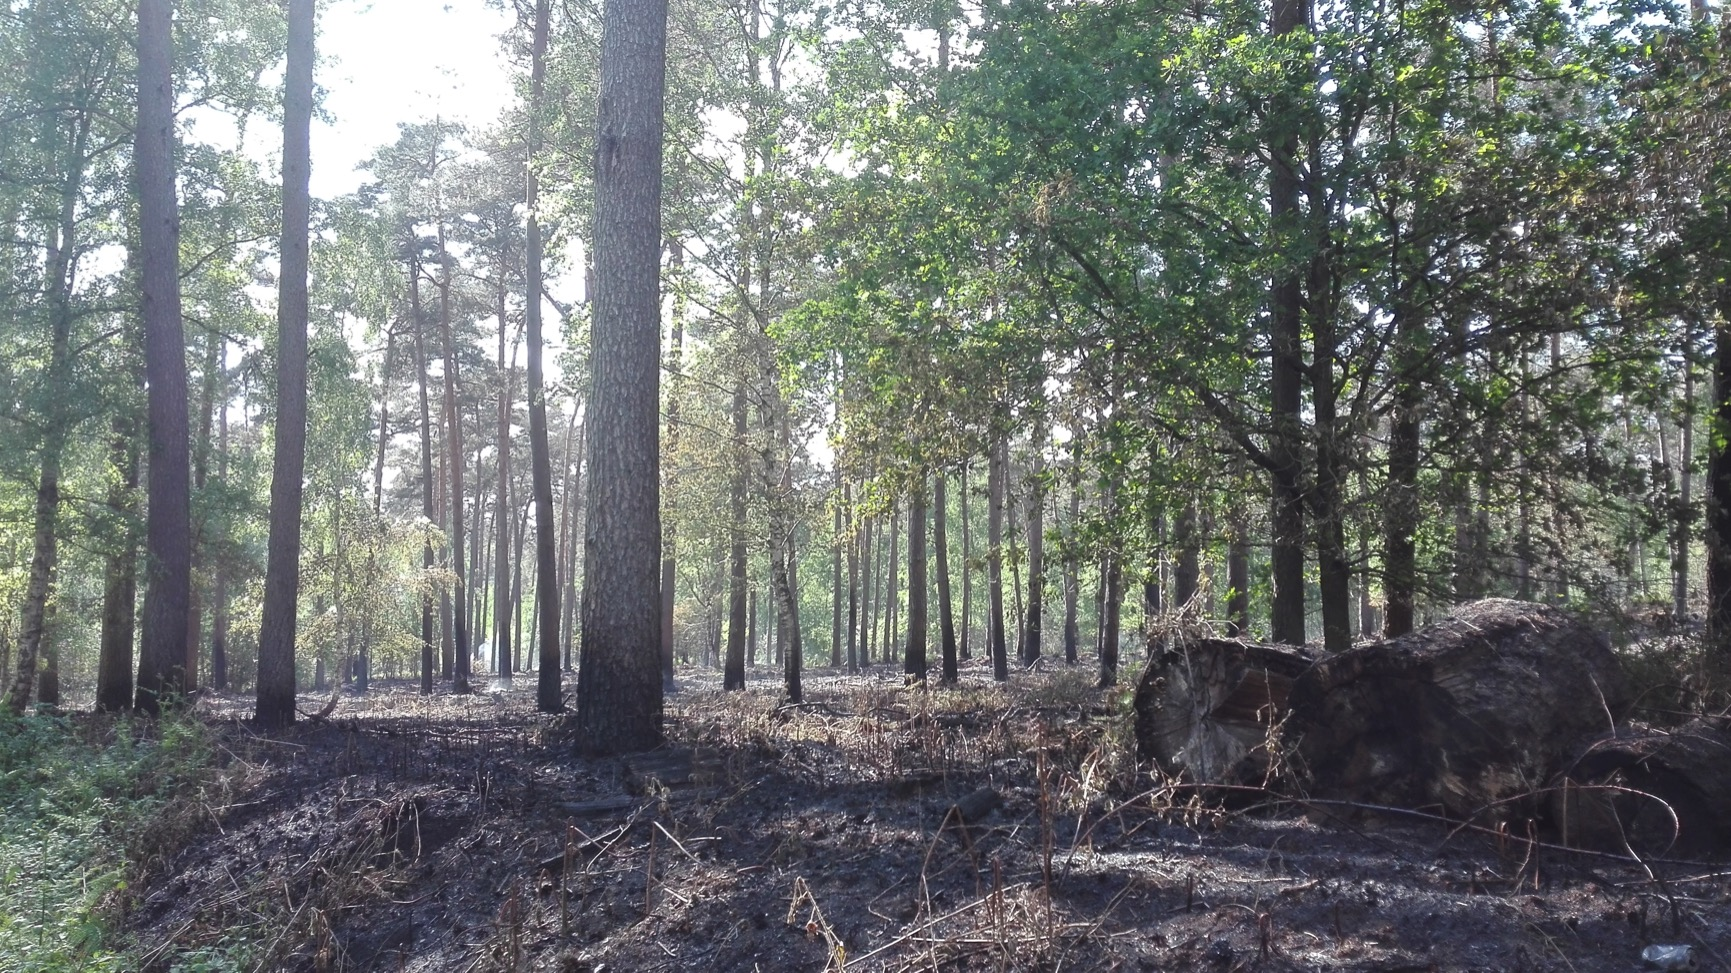 Feux de forêt à Stambruges